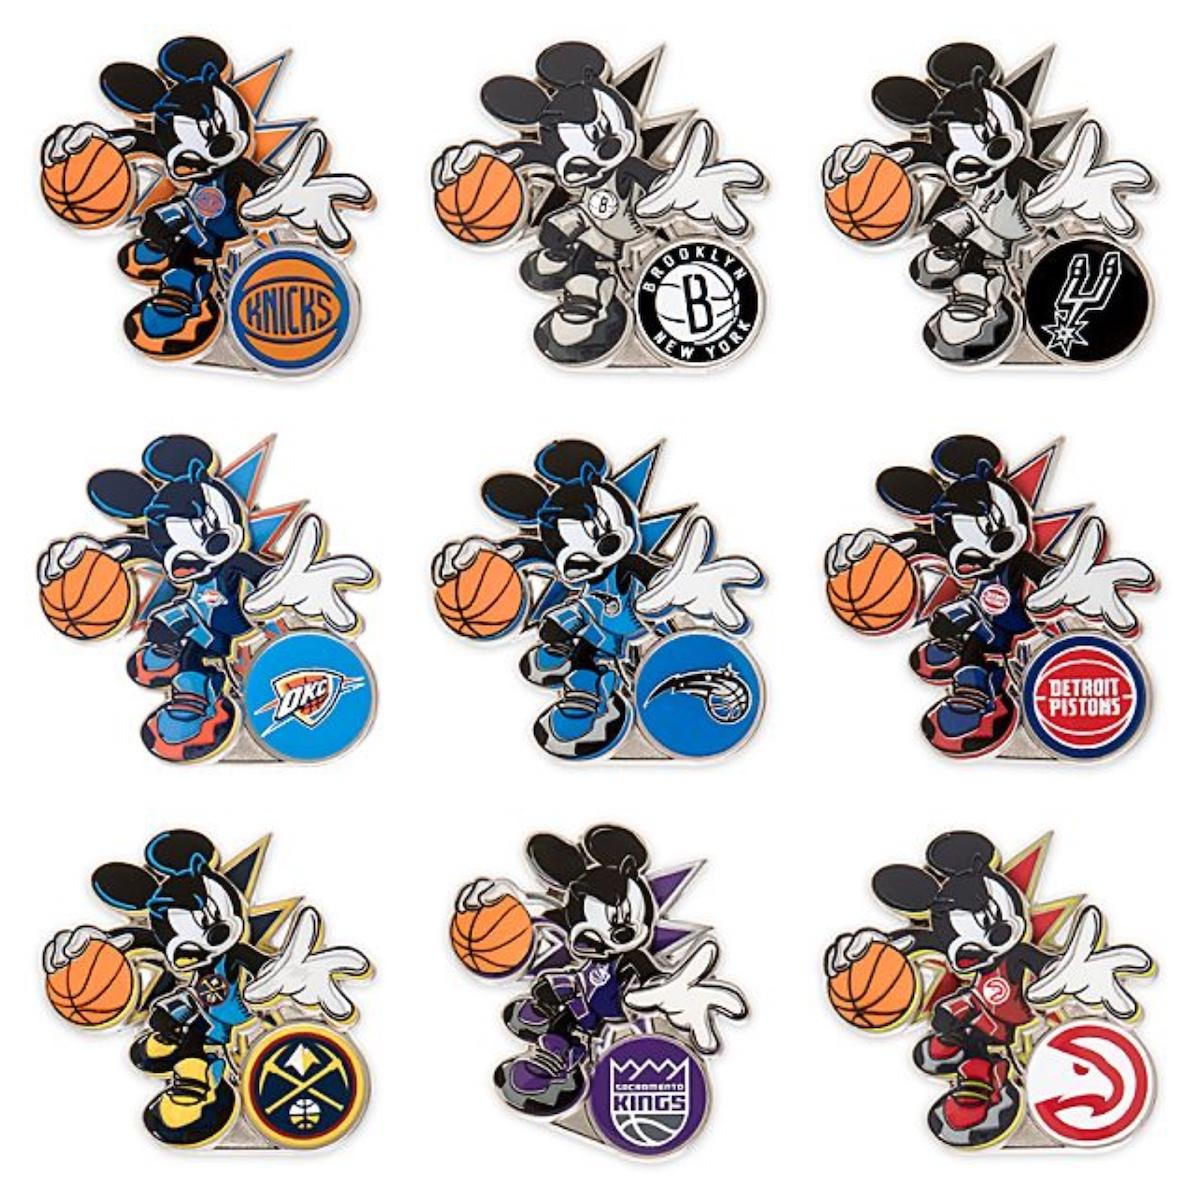 NBA Experience Disney Pin Collection